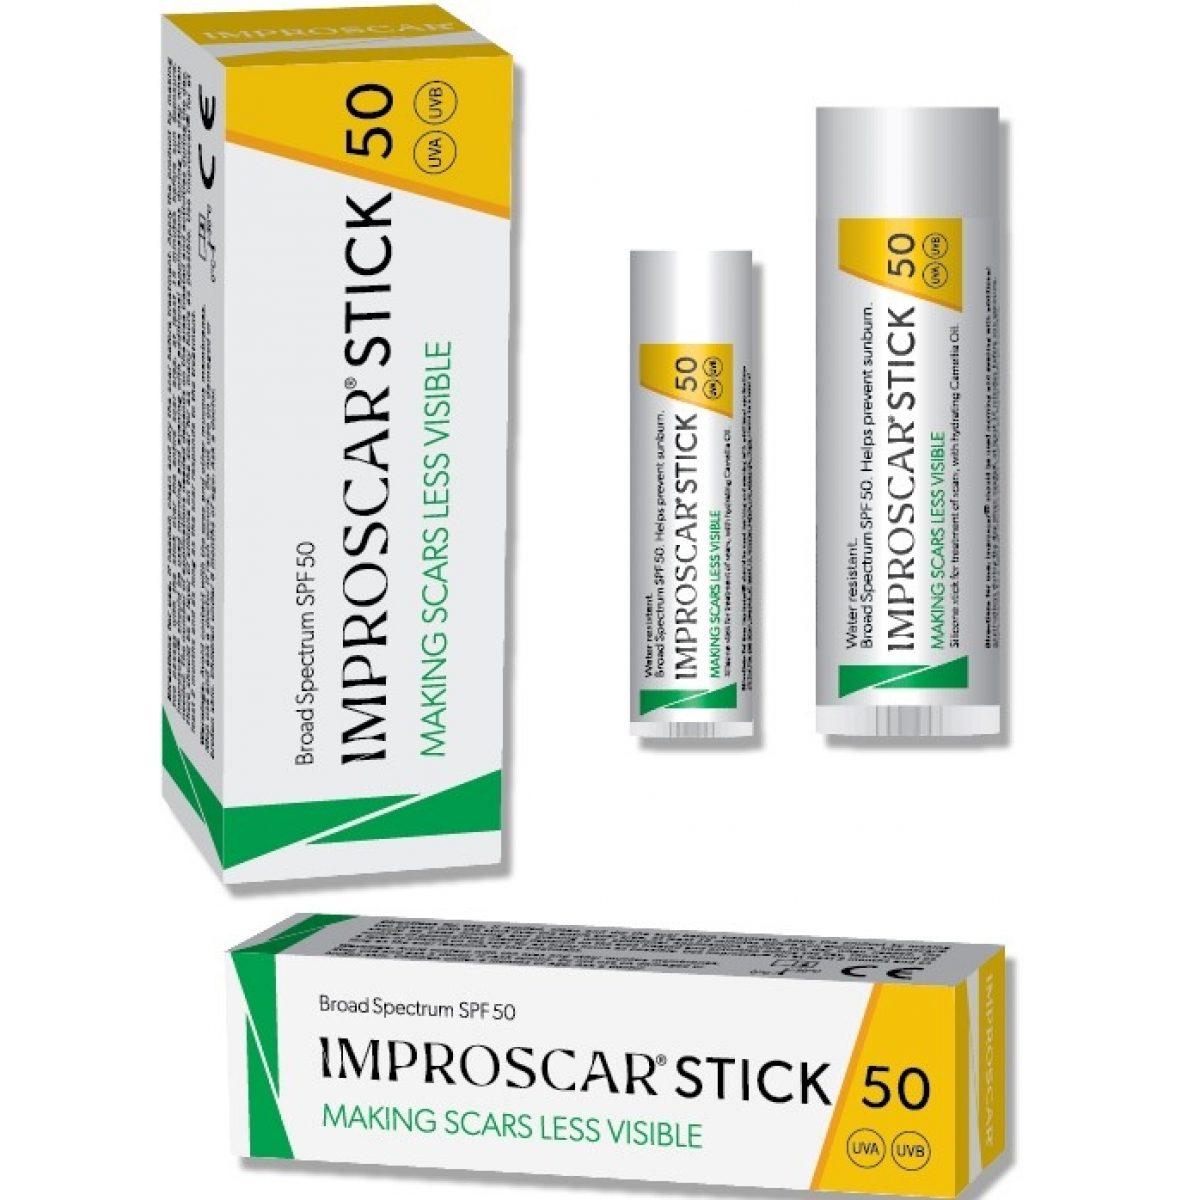 Improscar® Stick Protectie Solara SPF 50